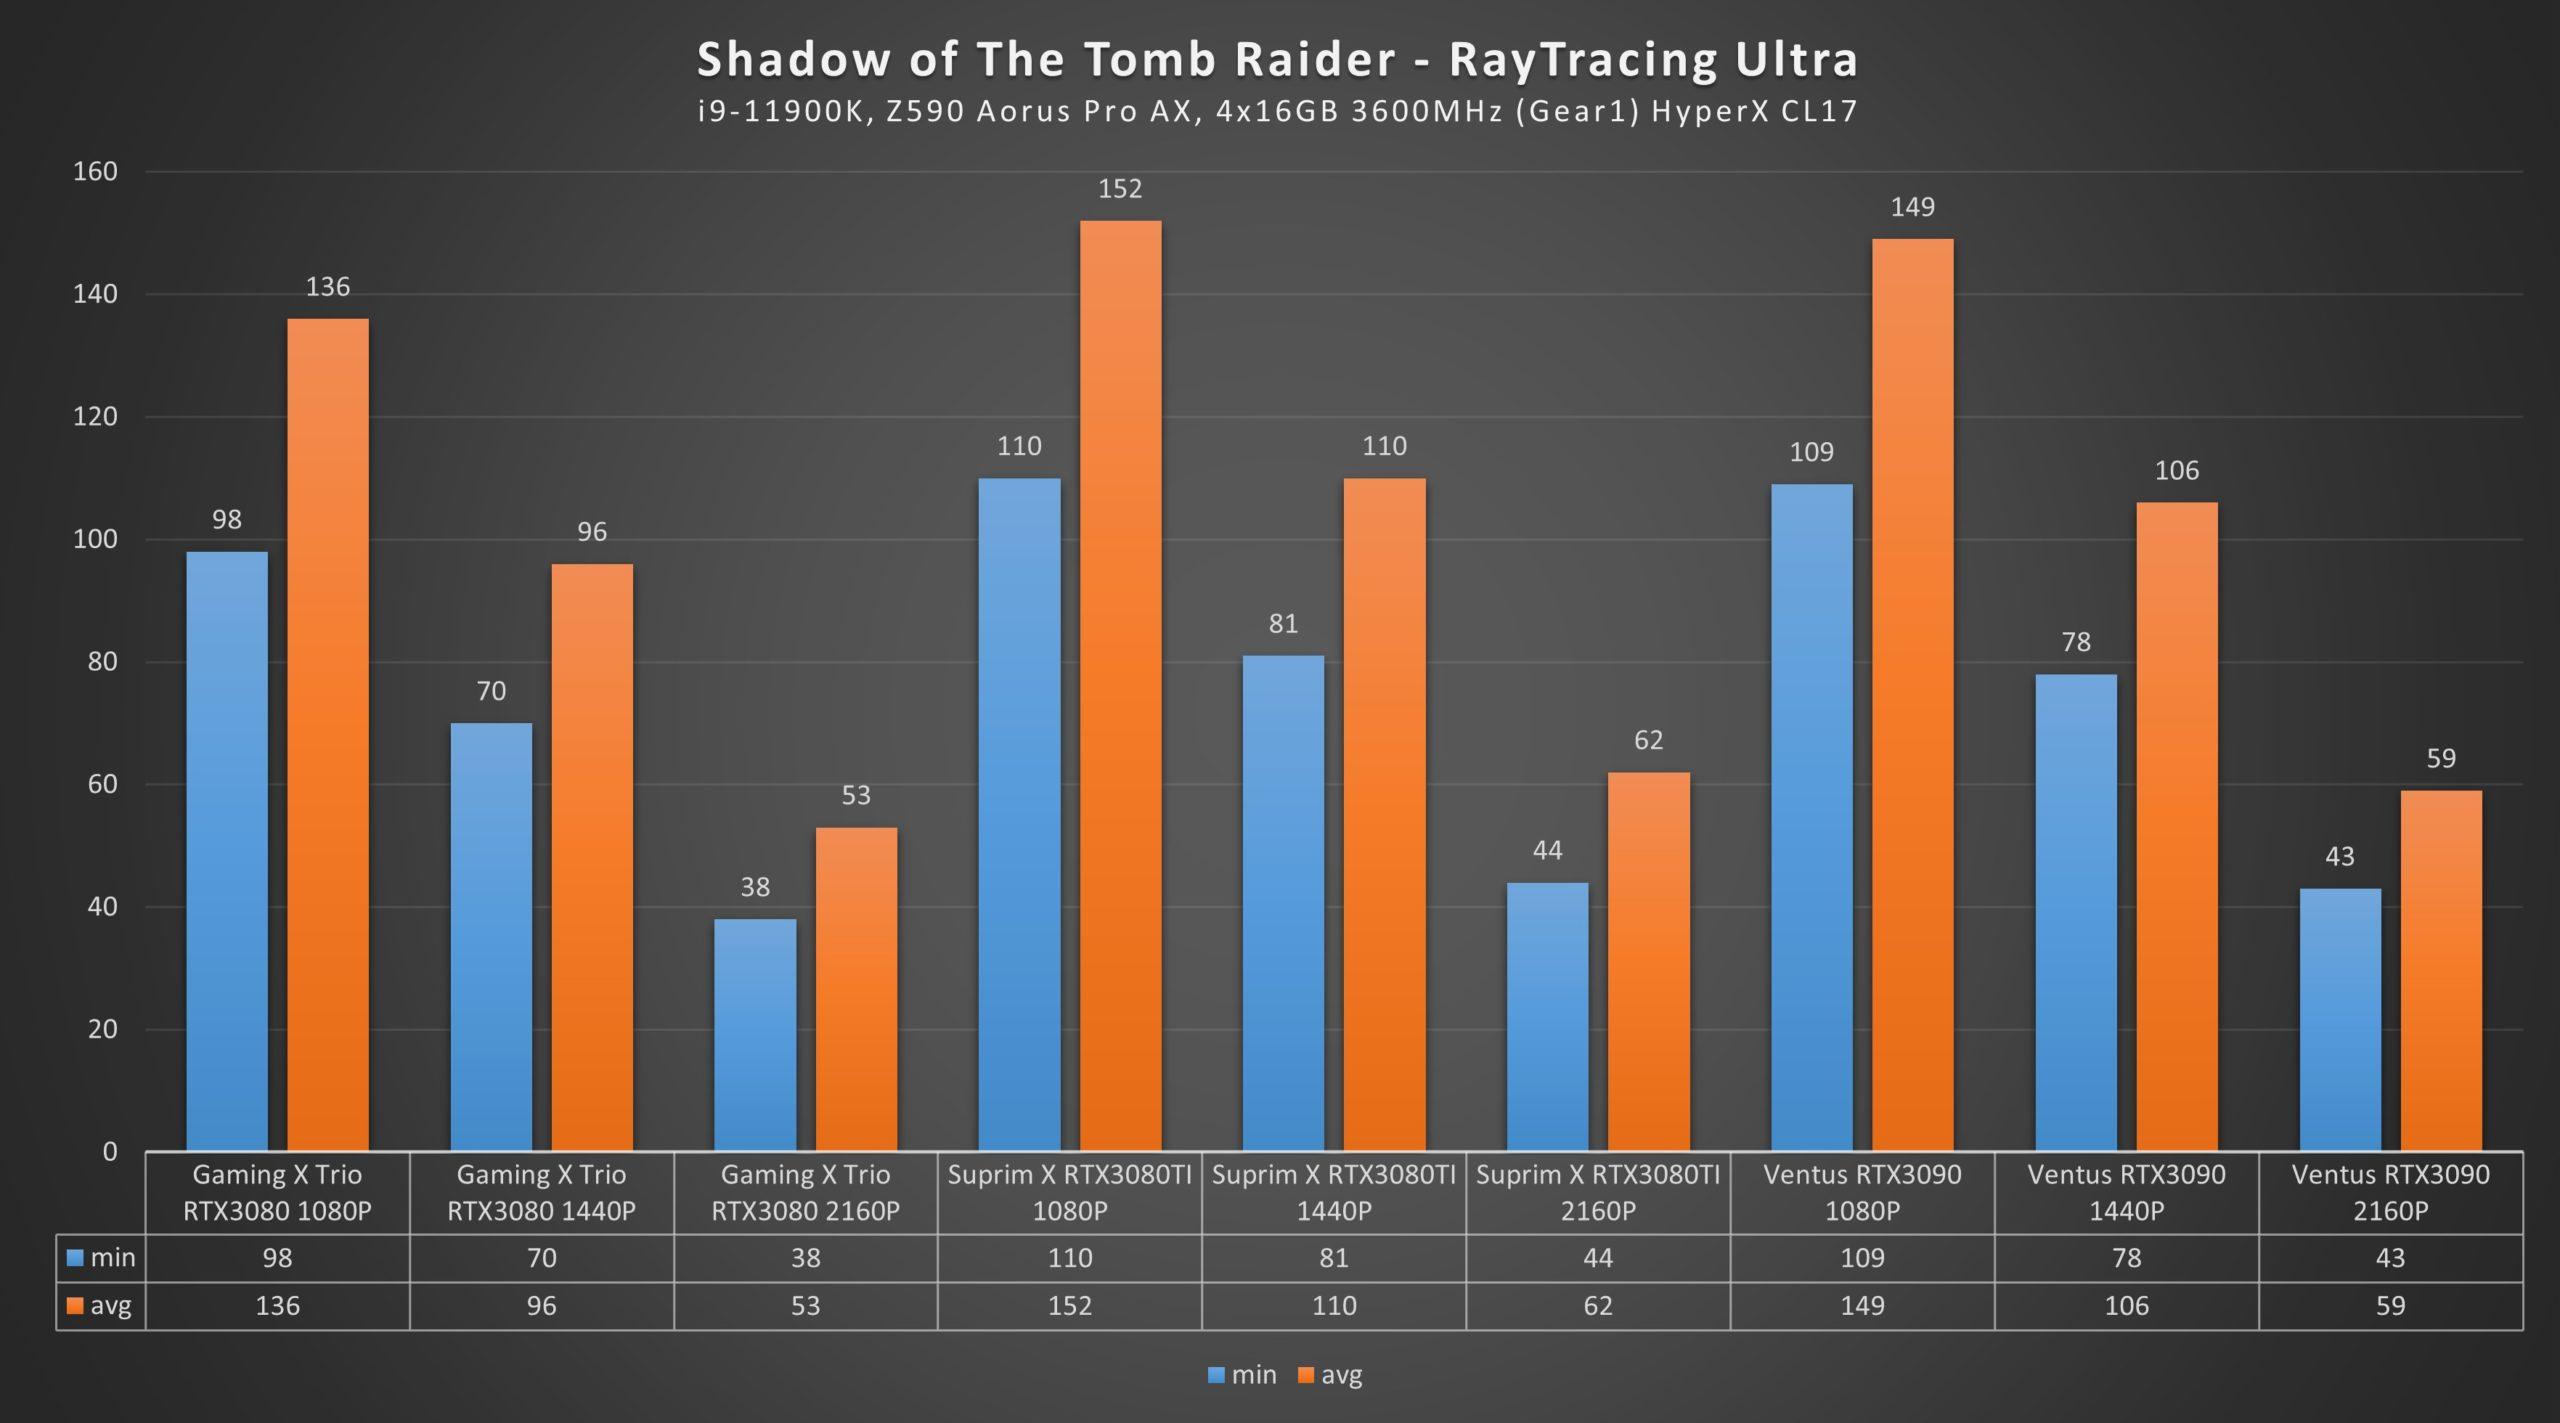 RTX 3080 Ti Shadow of the Tomb Raider Ultra Raytracing